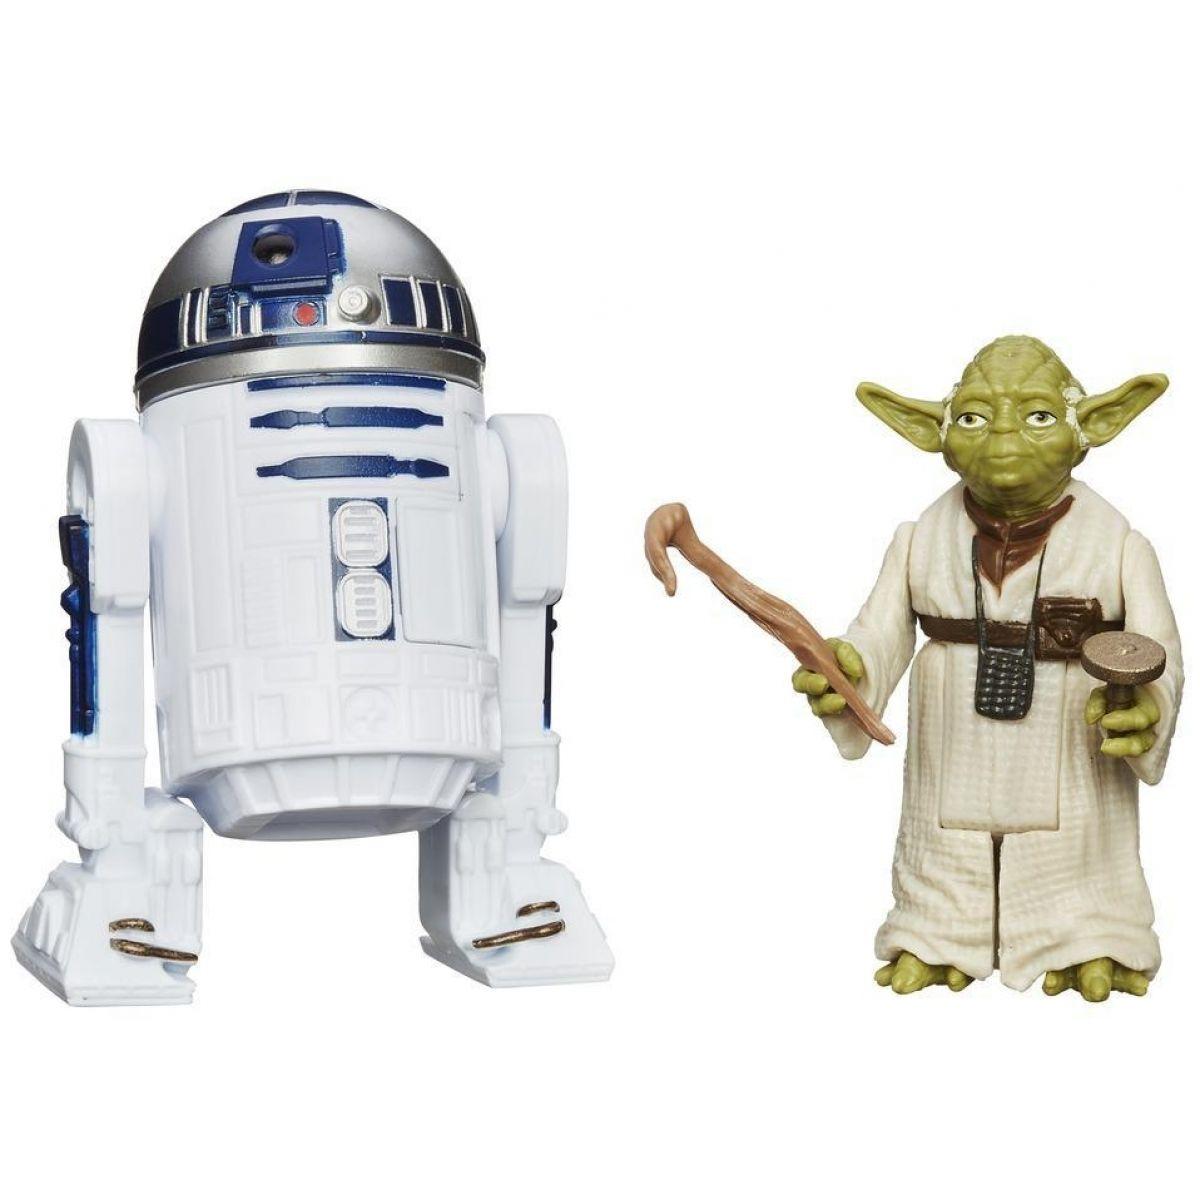 Star Wars akční figurky 2ks Hasbro A5228 - R2-D2 a Yoda